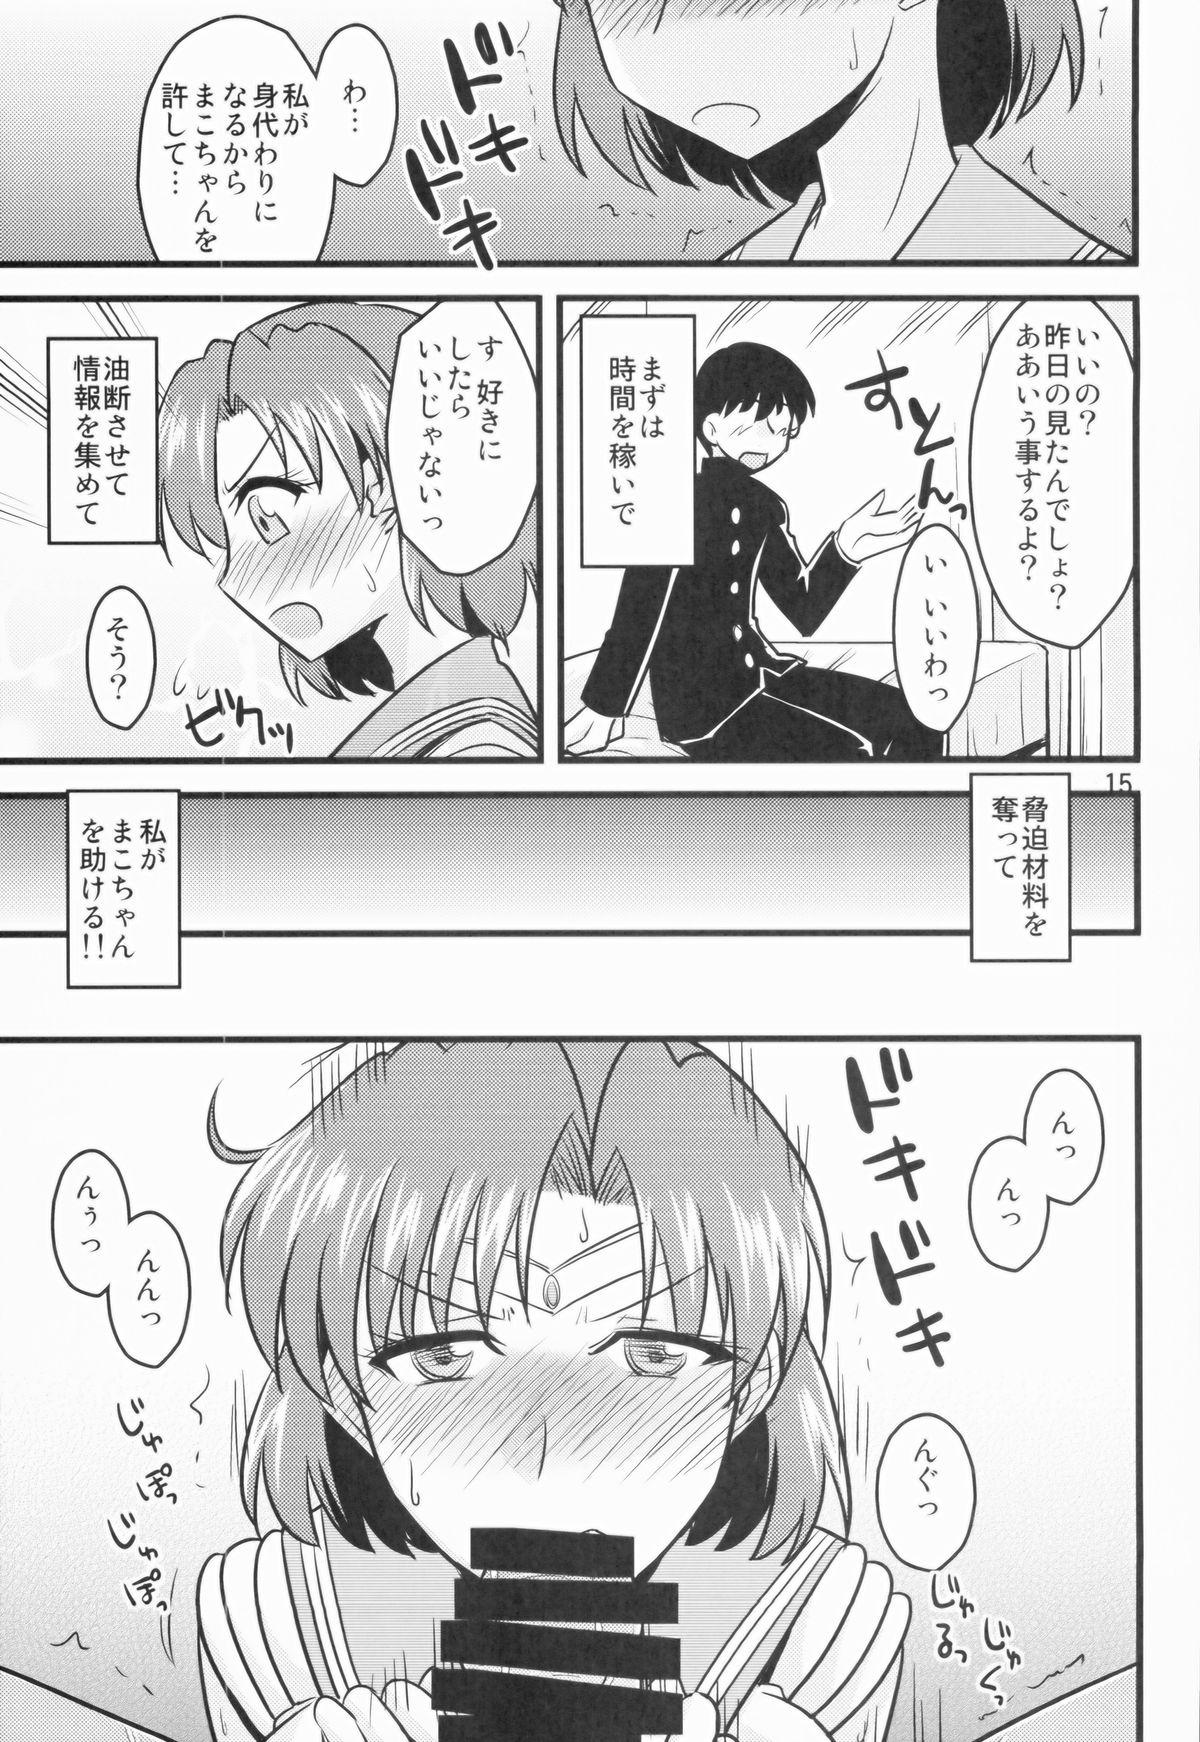 Suimoku no Musume 14